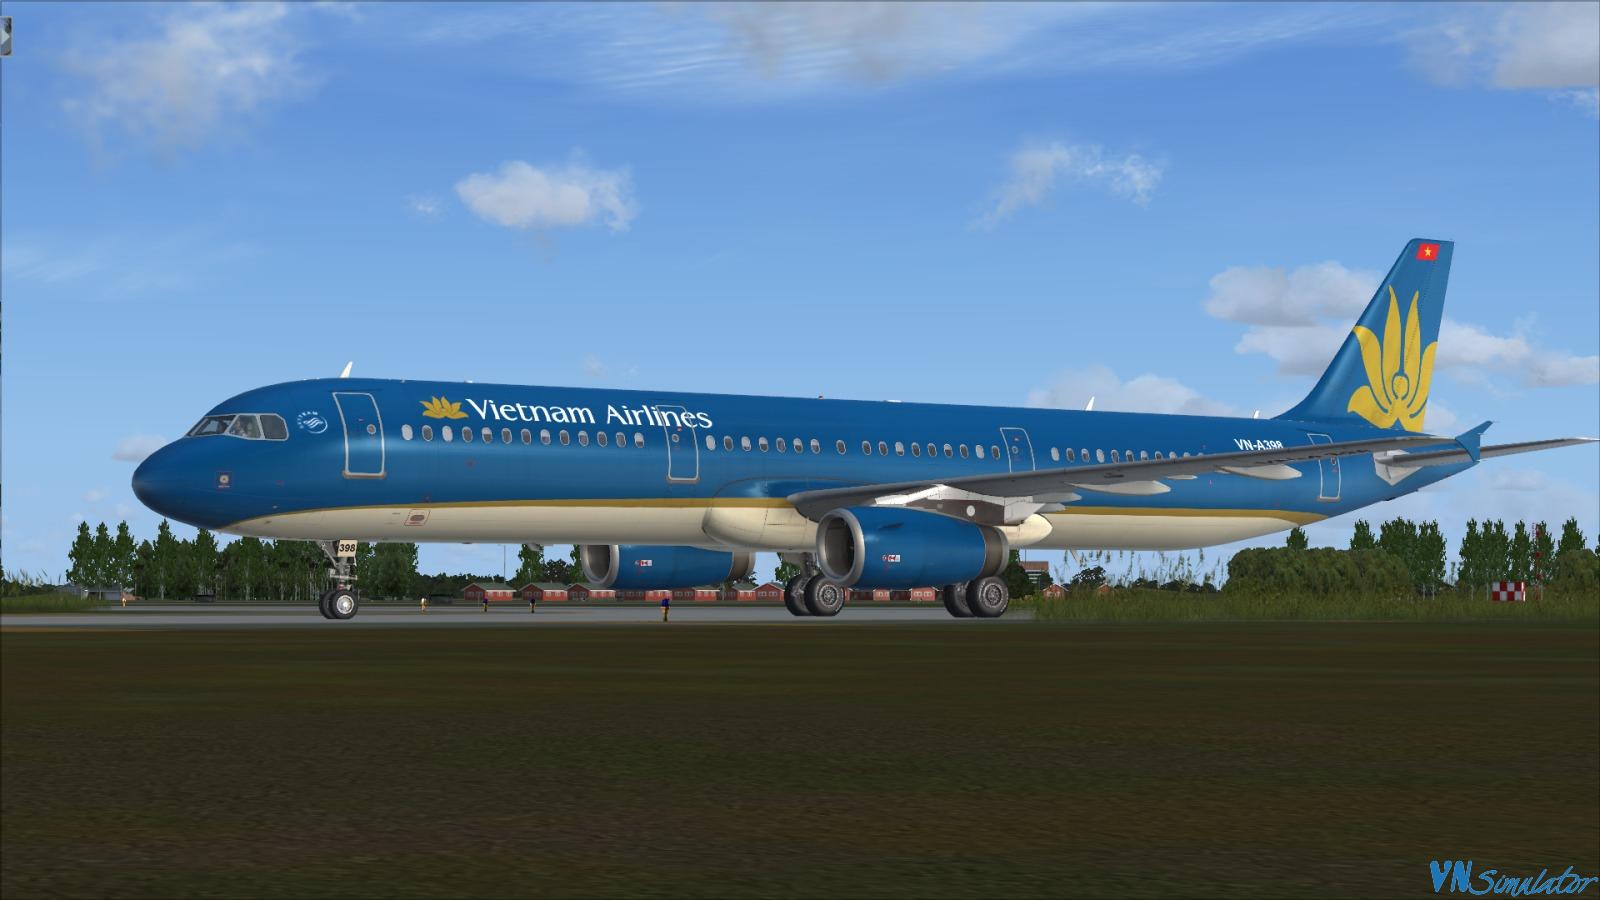 FSX/P3D - Paint Aerosoft Airbus A320/321 | Viet Nam